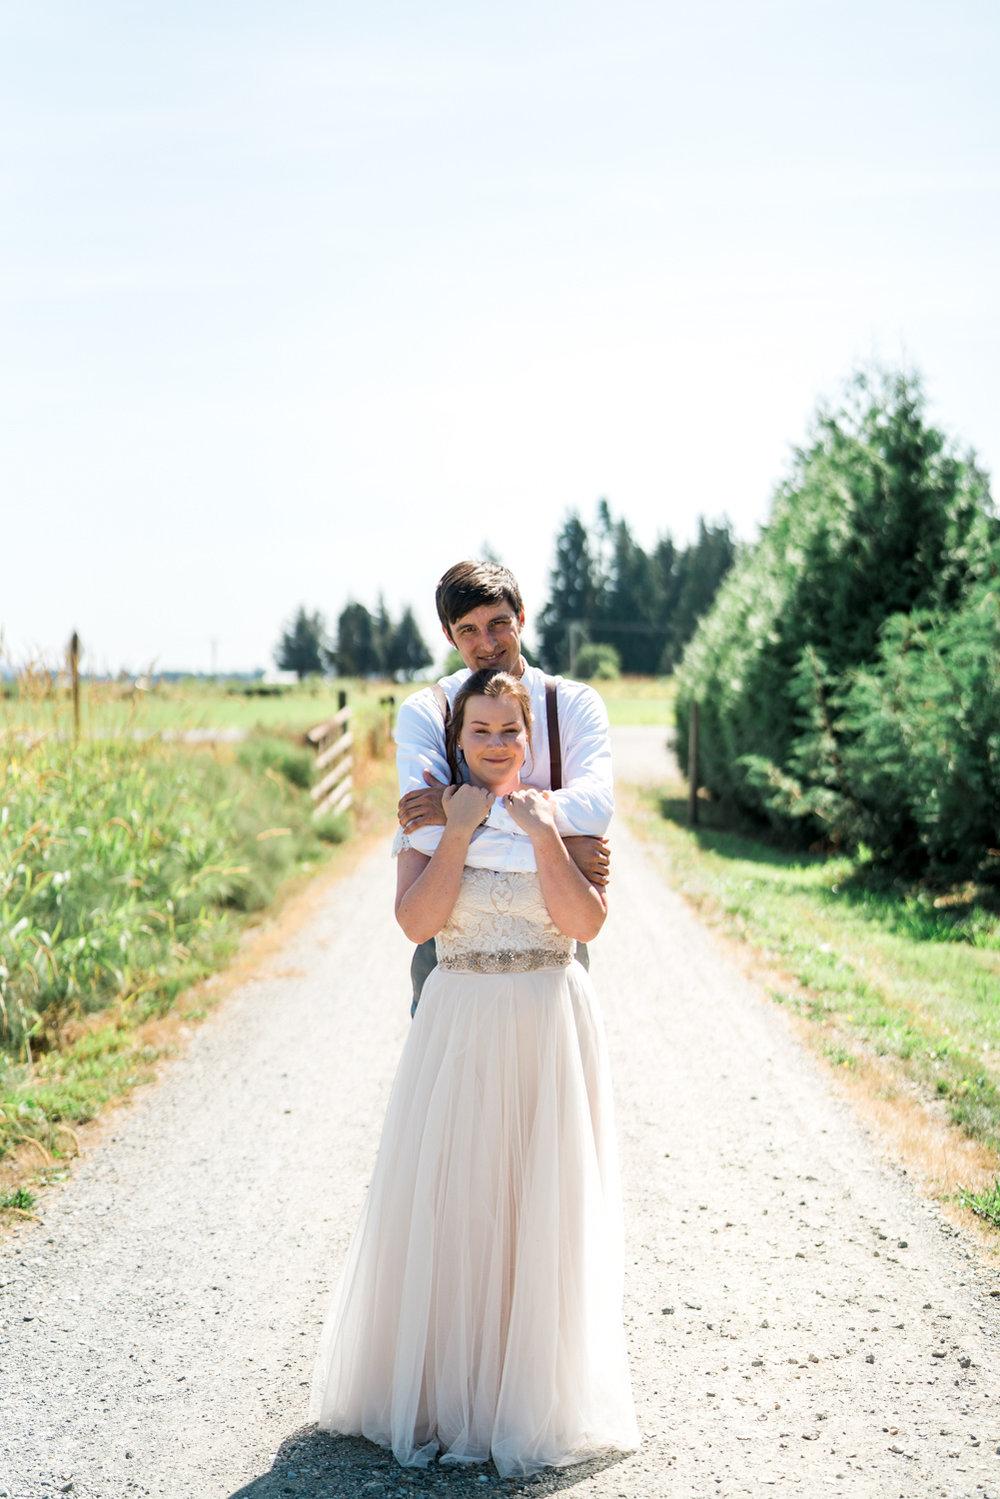 April Yentas Photography - Hannah & Ian-23.jpg